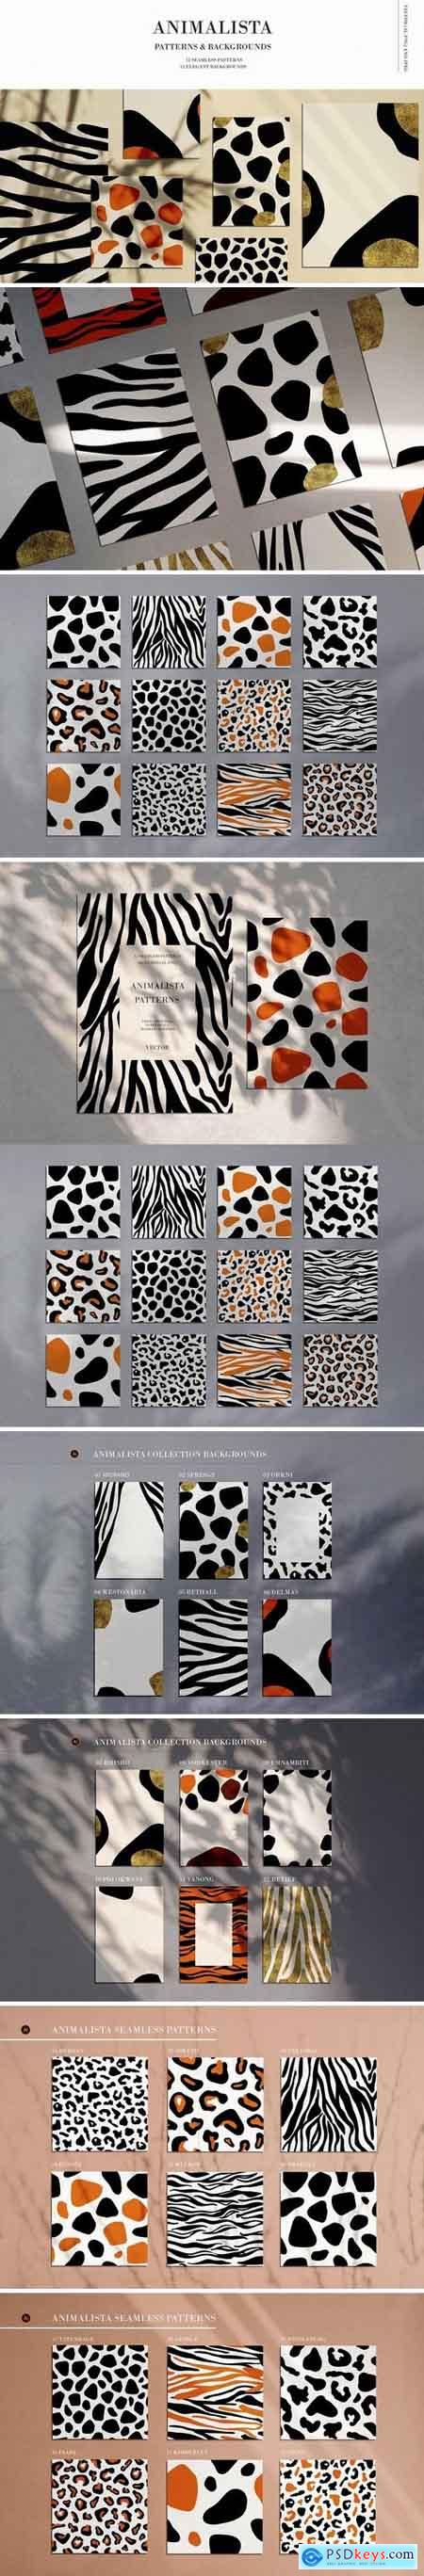 Creativemarket Animalista - patterns collection